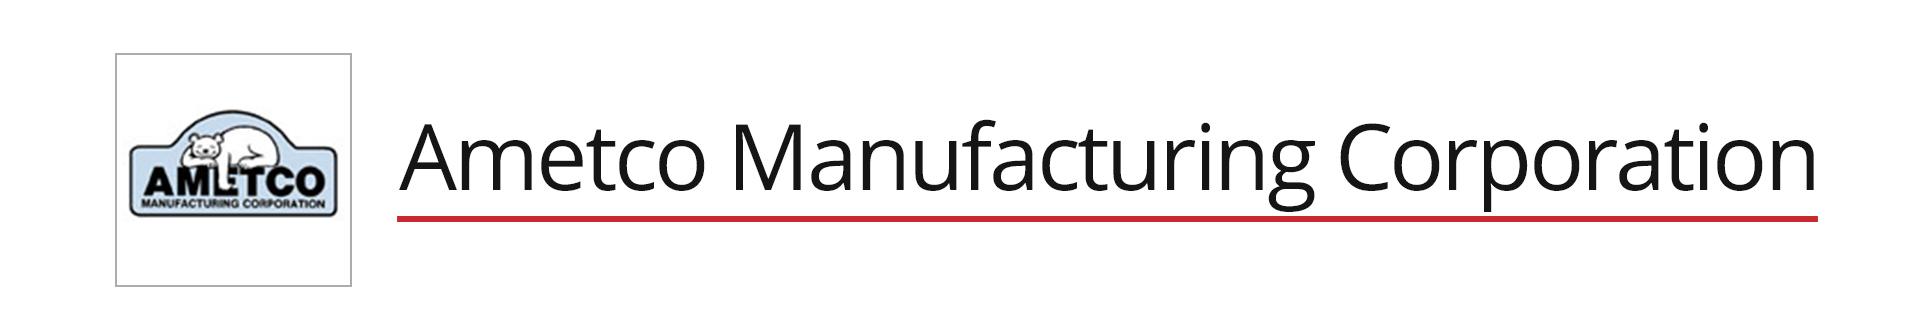 Ametco-Manufacturing-Corporation_CADBlock-Header.jpg